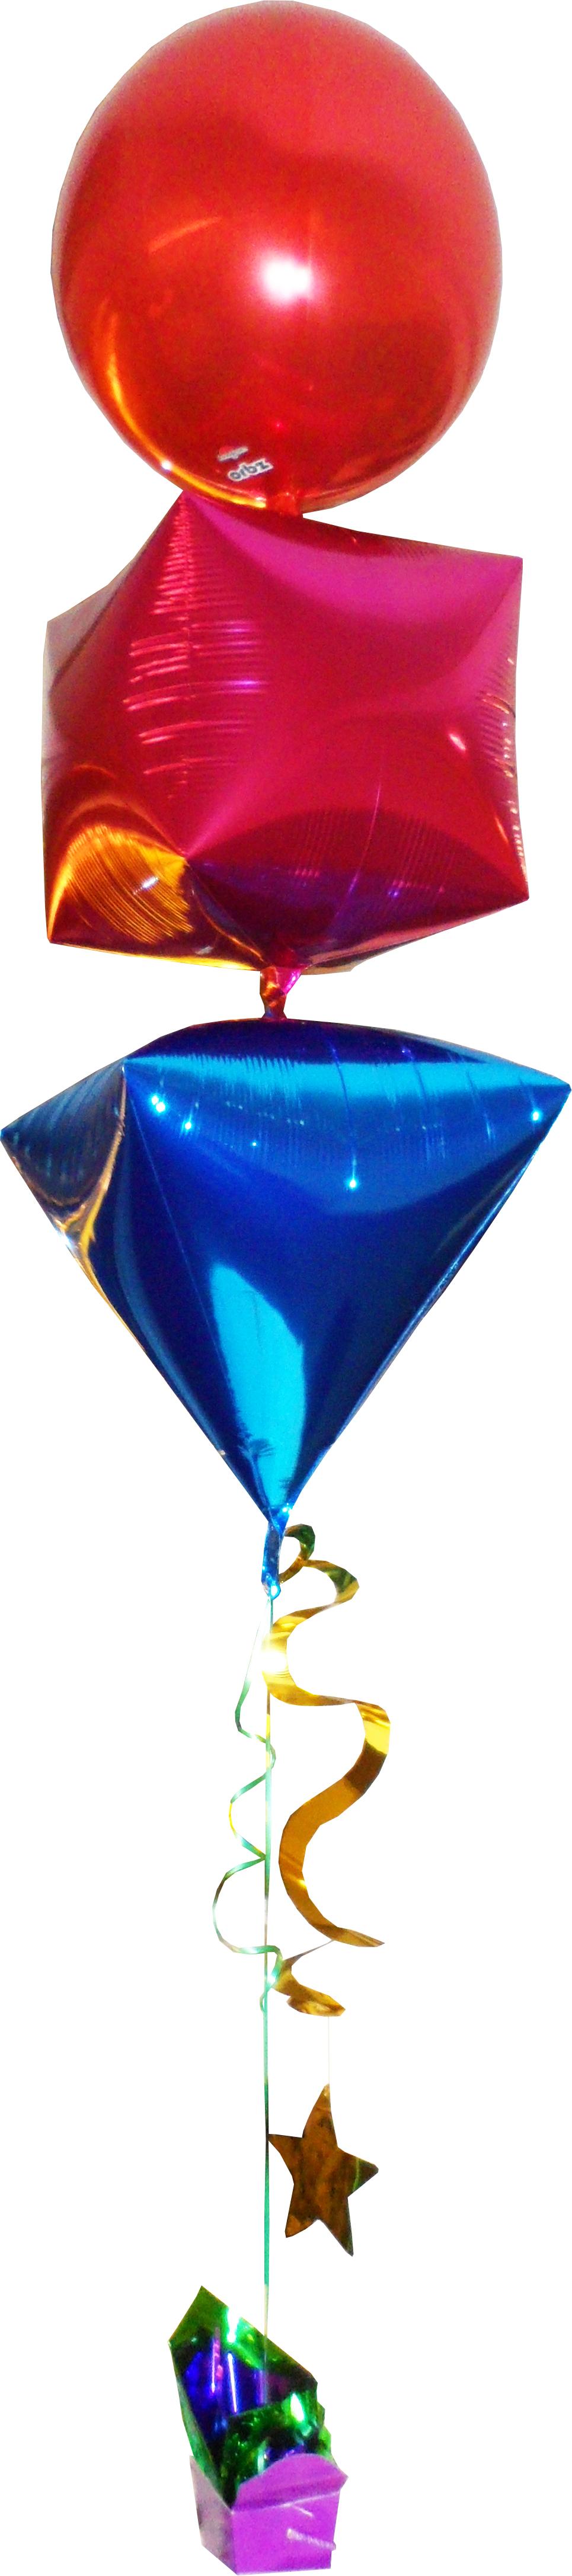 Orbz Diamond Cube Balloon Bouquet